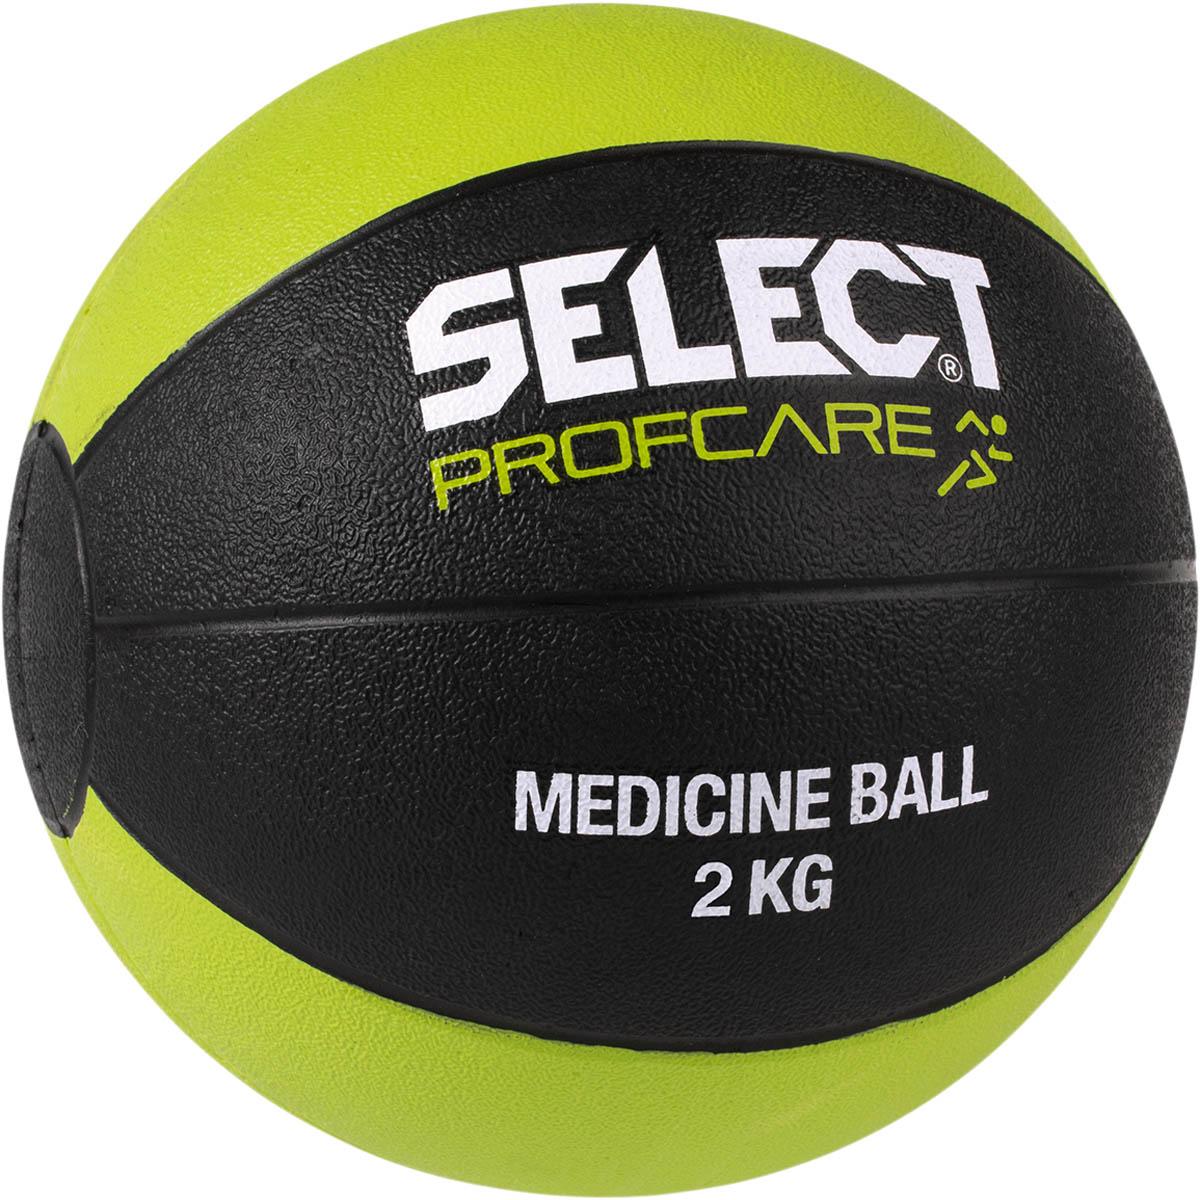 Select Medicine ball 2 kg